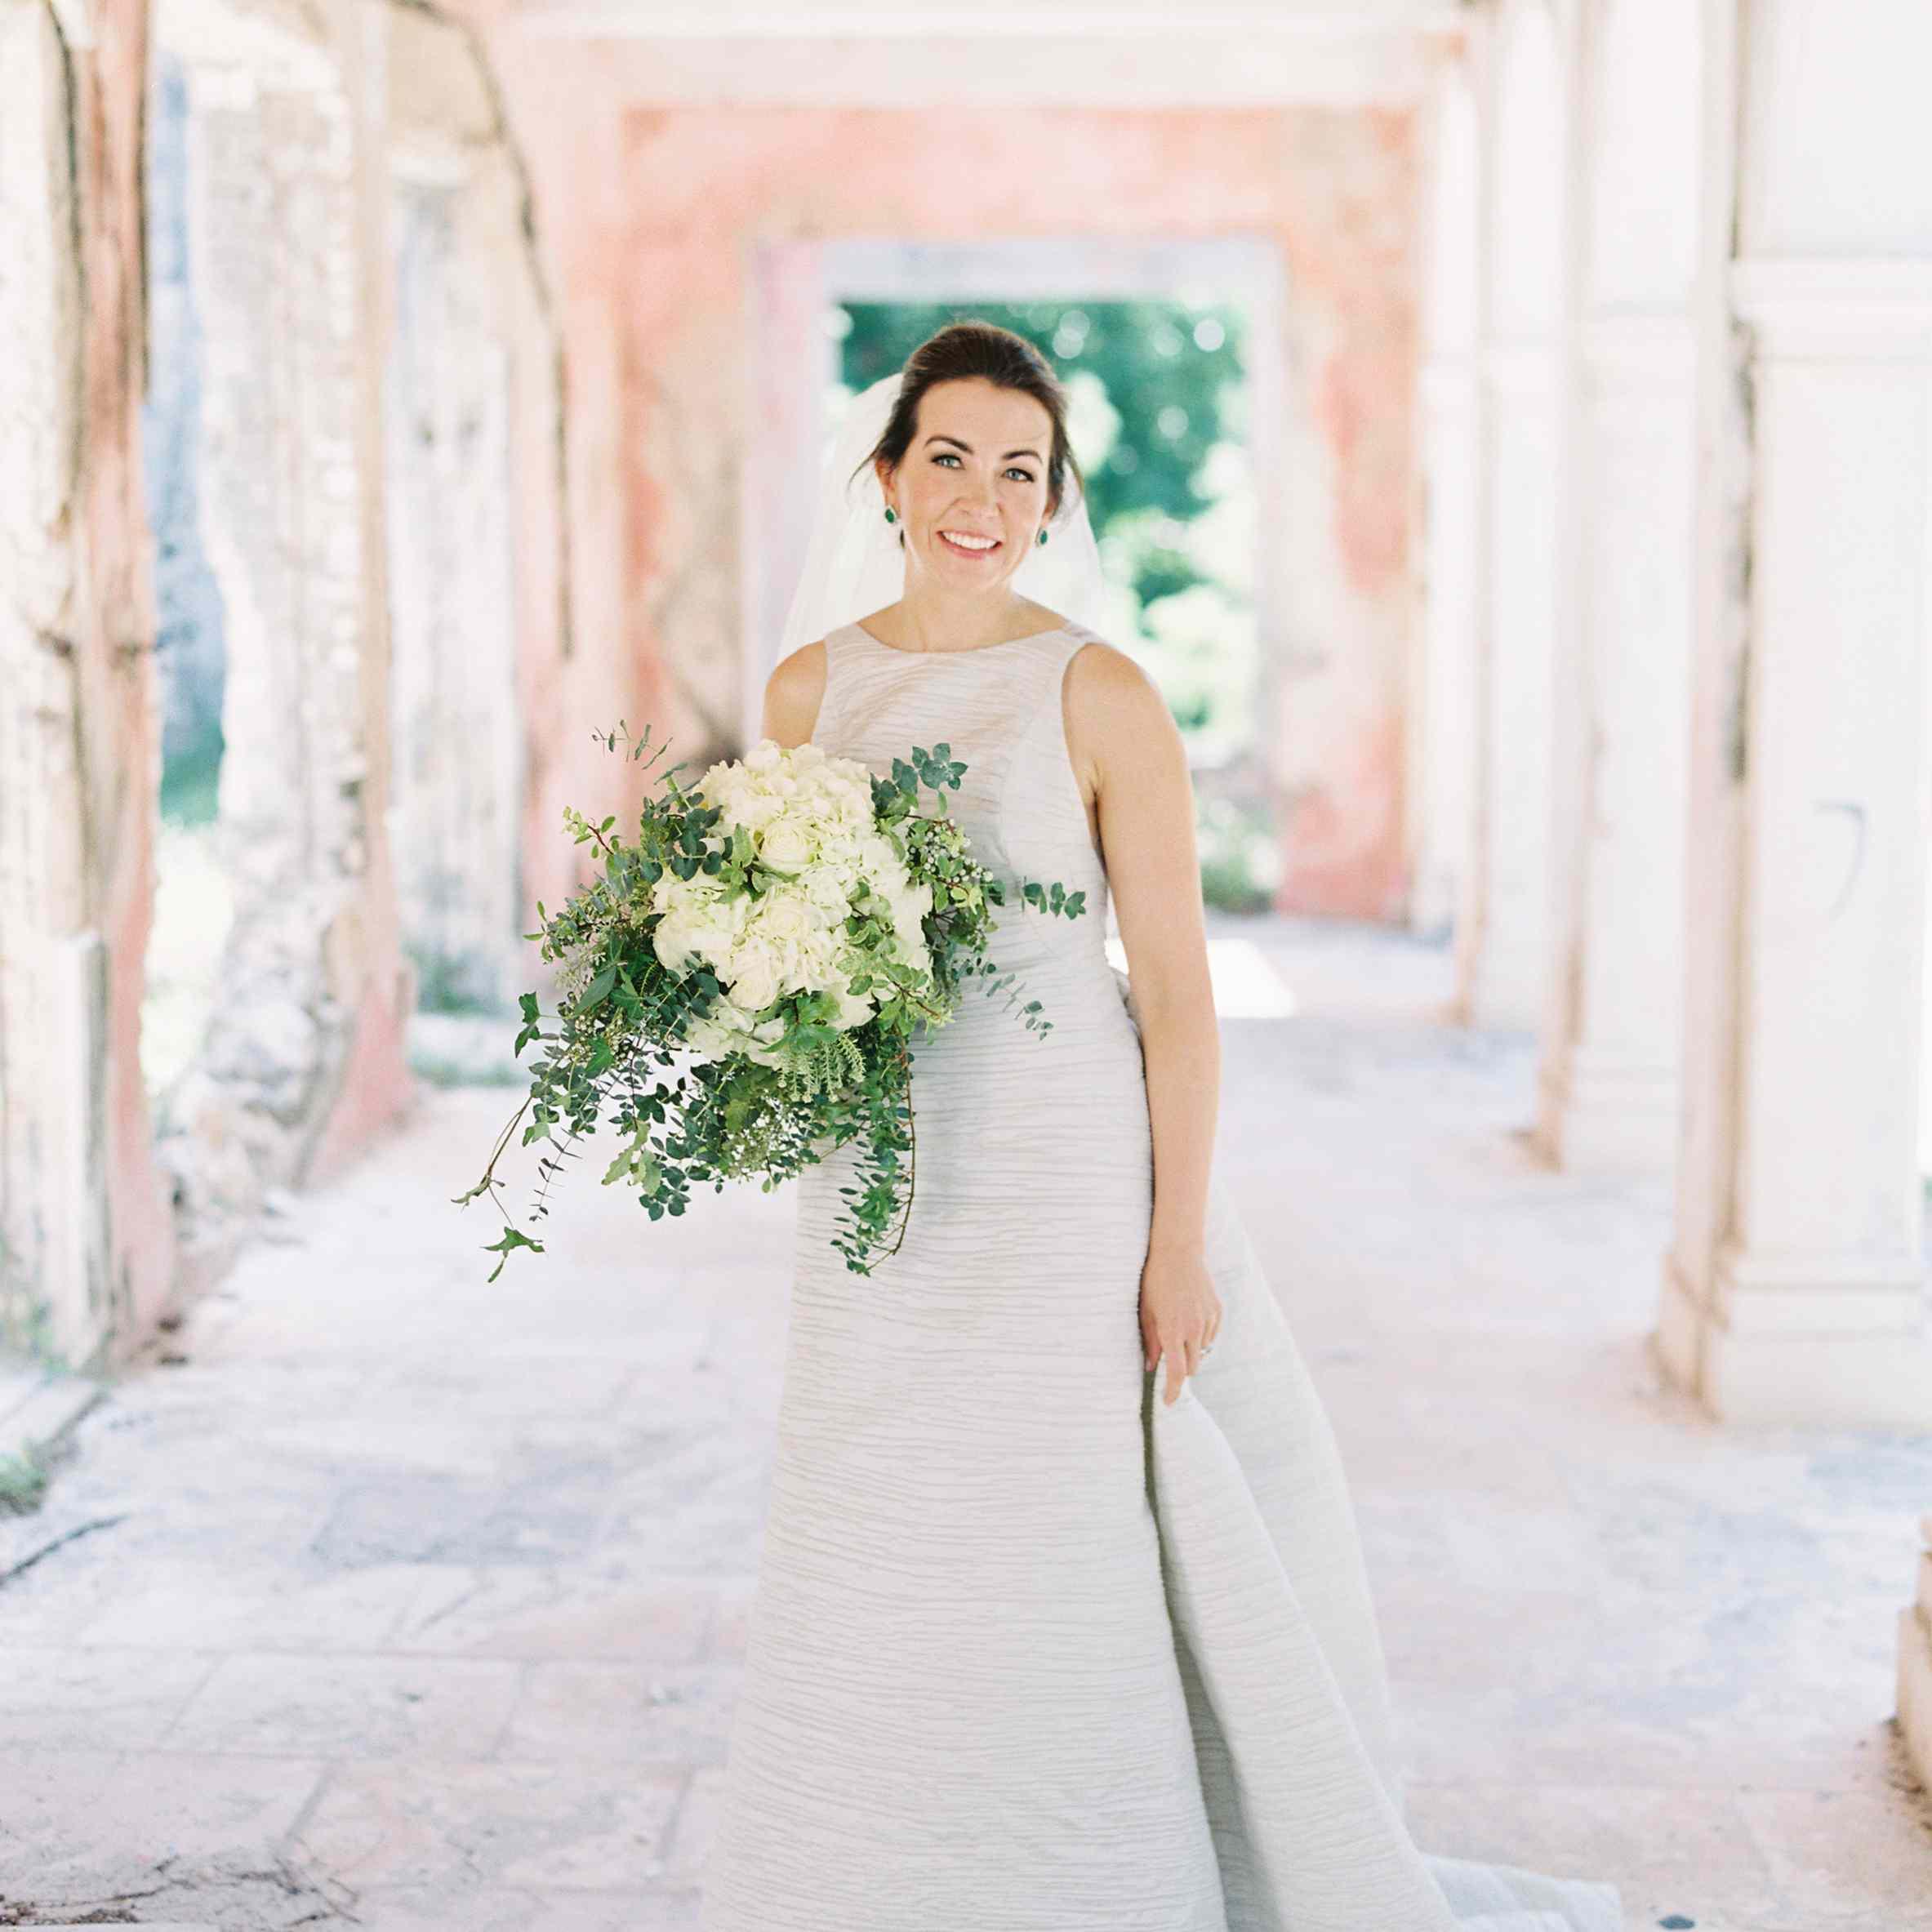 <p>bride holding wedding bouquet</p><br><br>